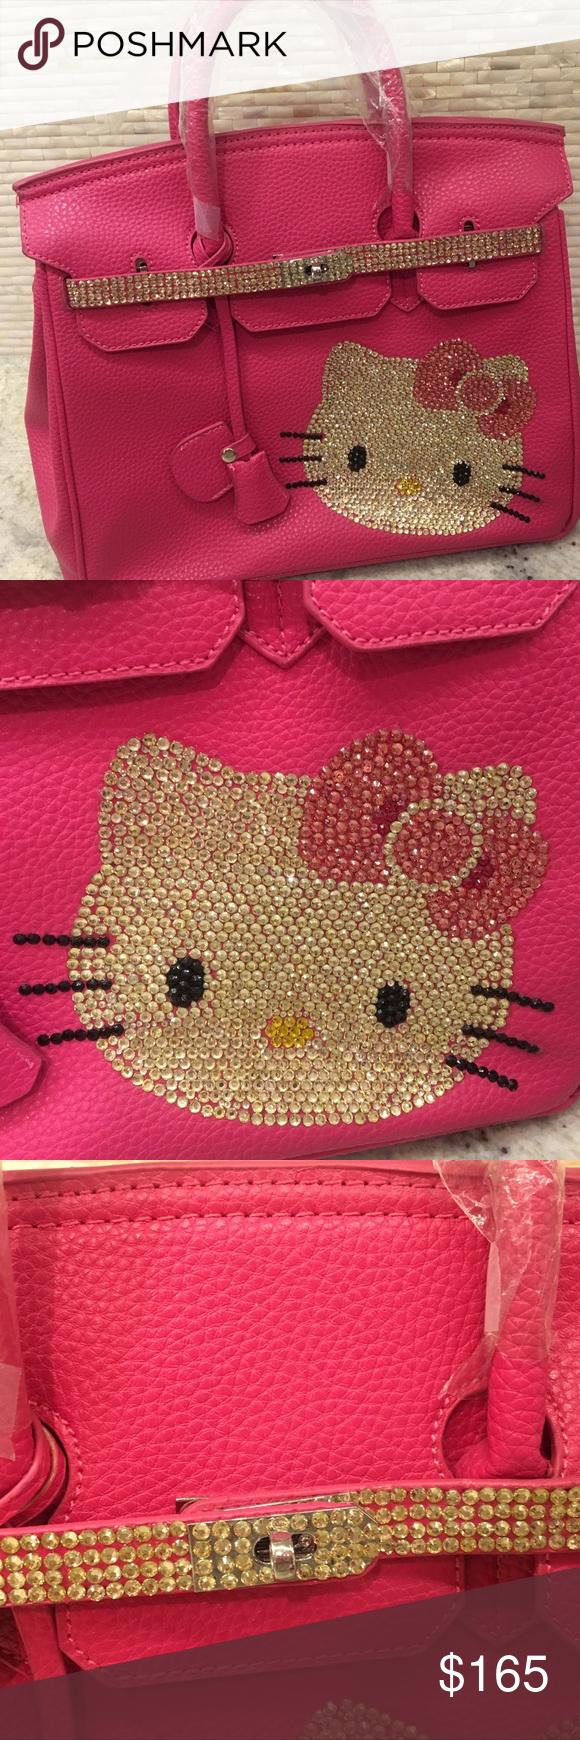 Hello Kitty Birkin Style Bag -Swarovski crystals Hermes Birkin-style Hello  Kitty Togo Leather 96bc808476c3e